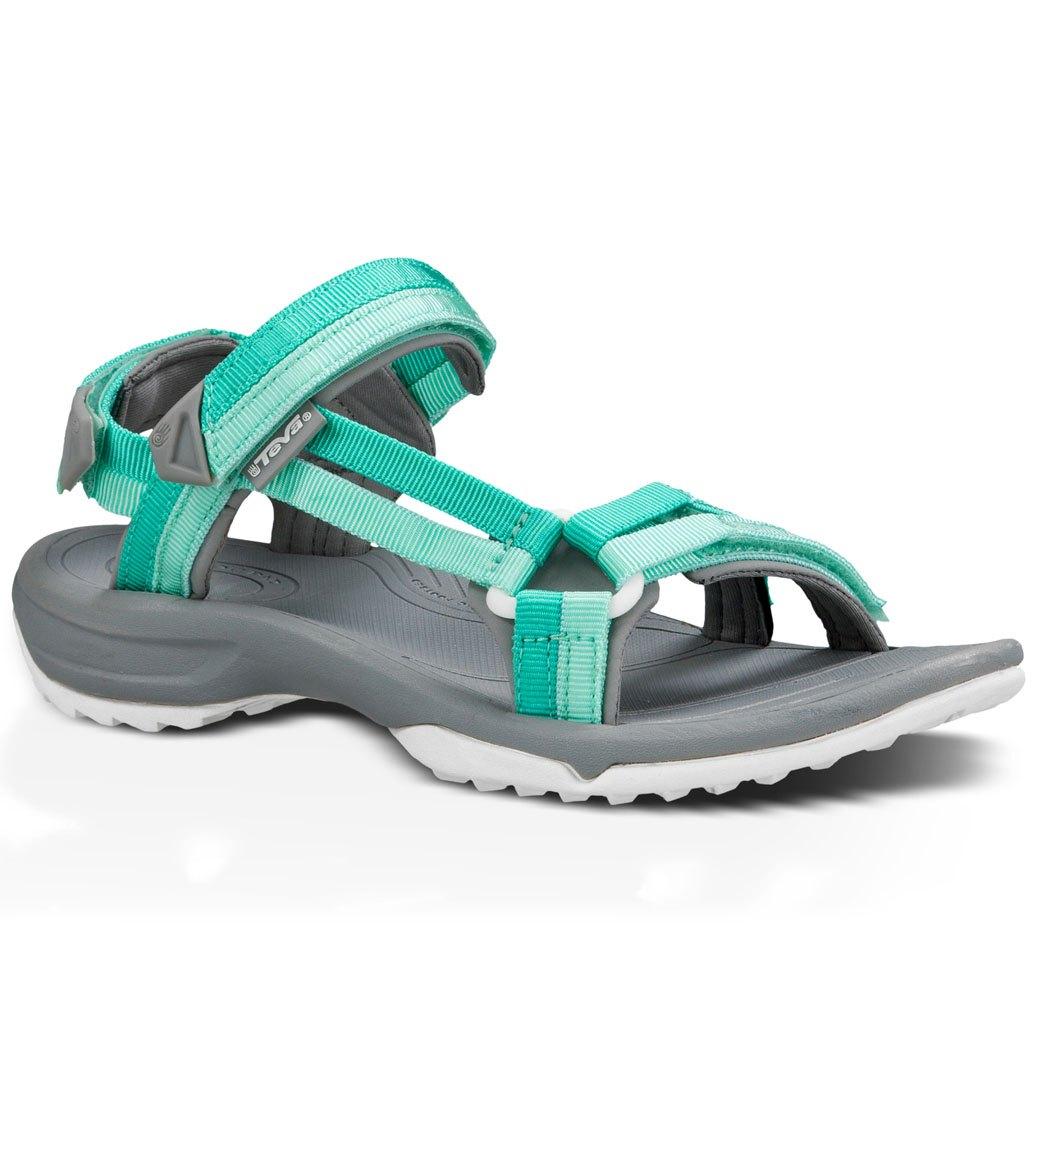 a5afc763628c Teva Women s Terra FI Lite Sandal at SwimOutlet.com - Free Shipping